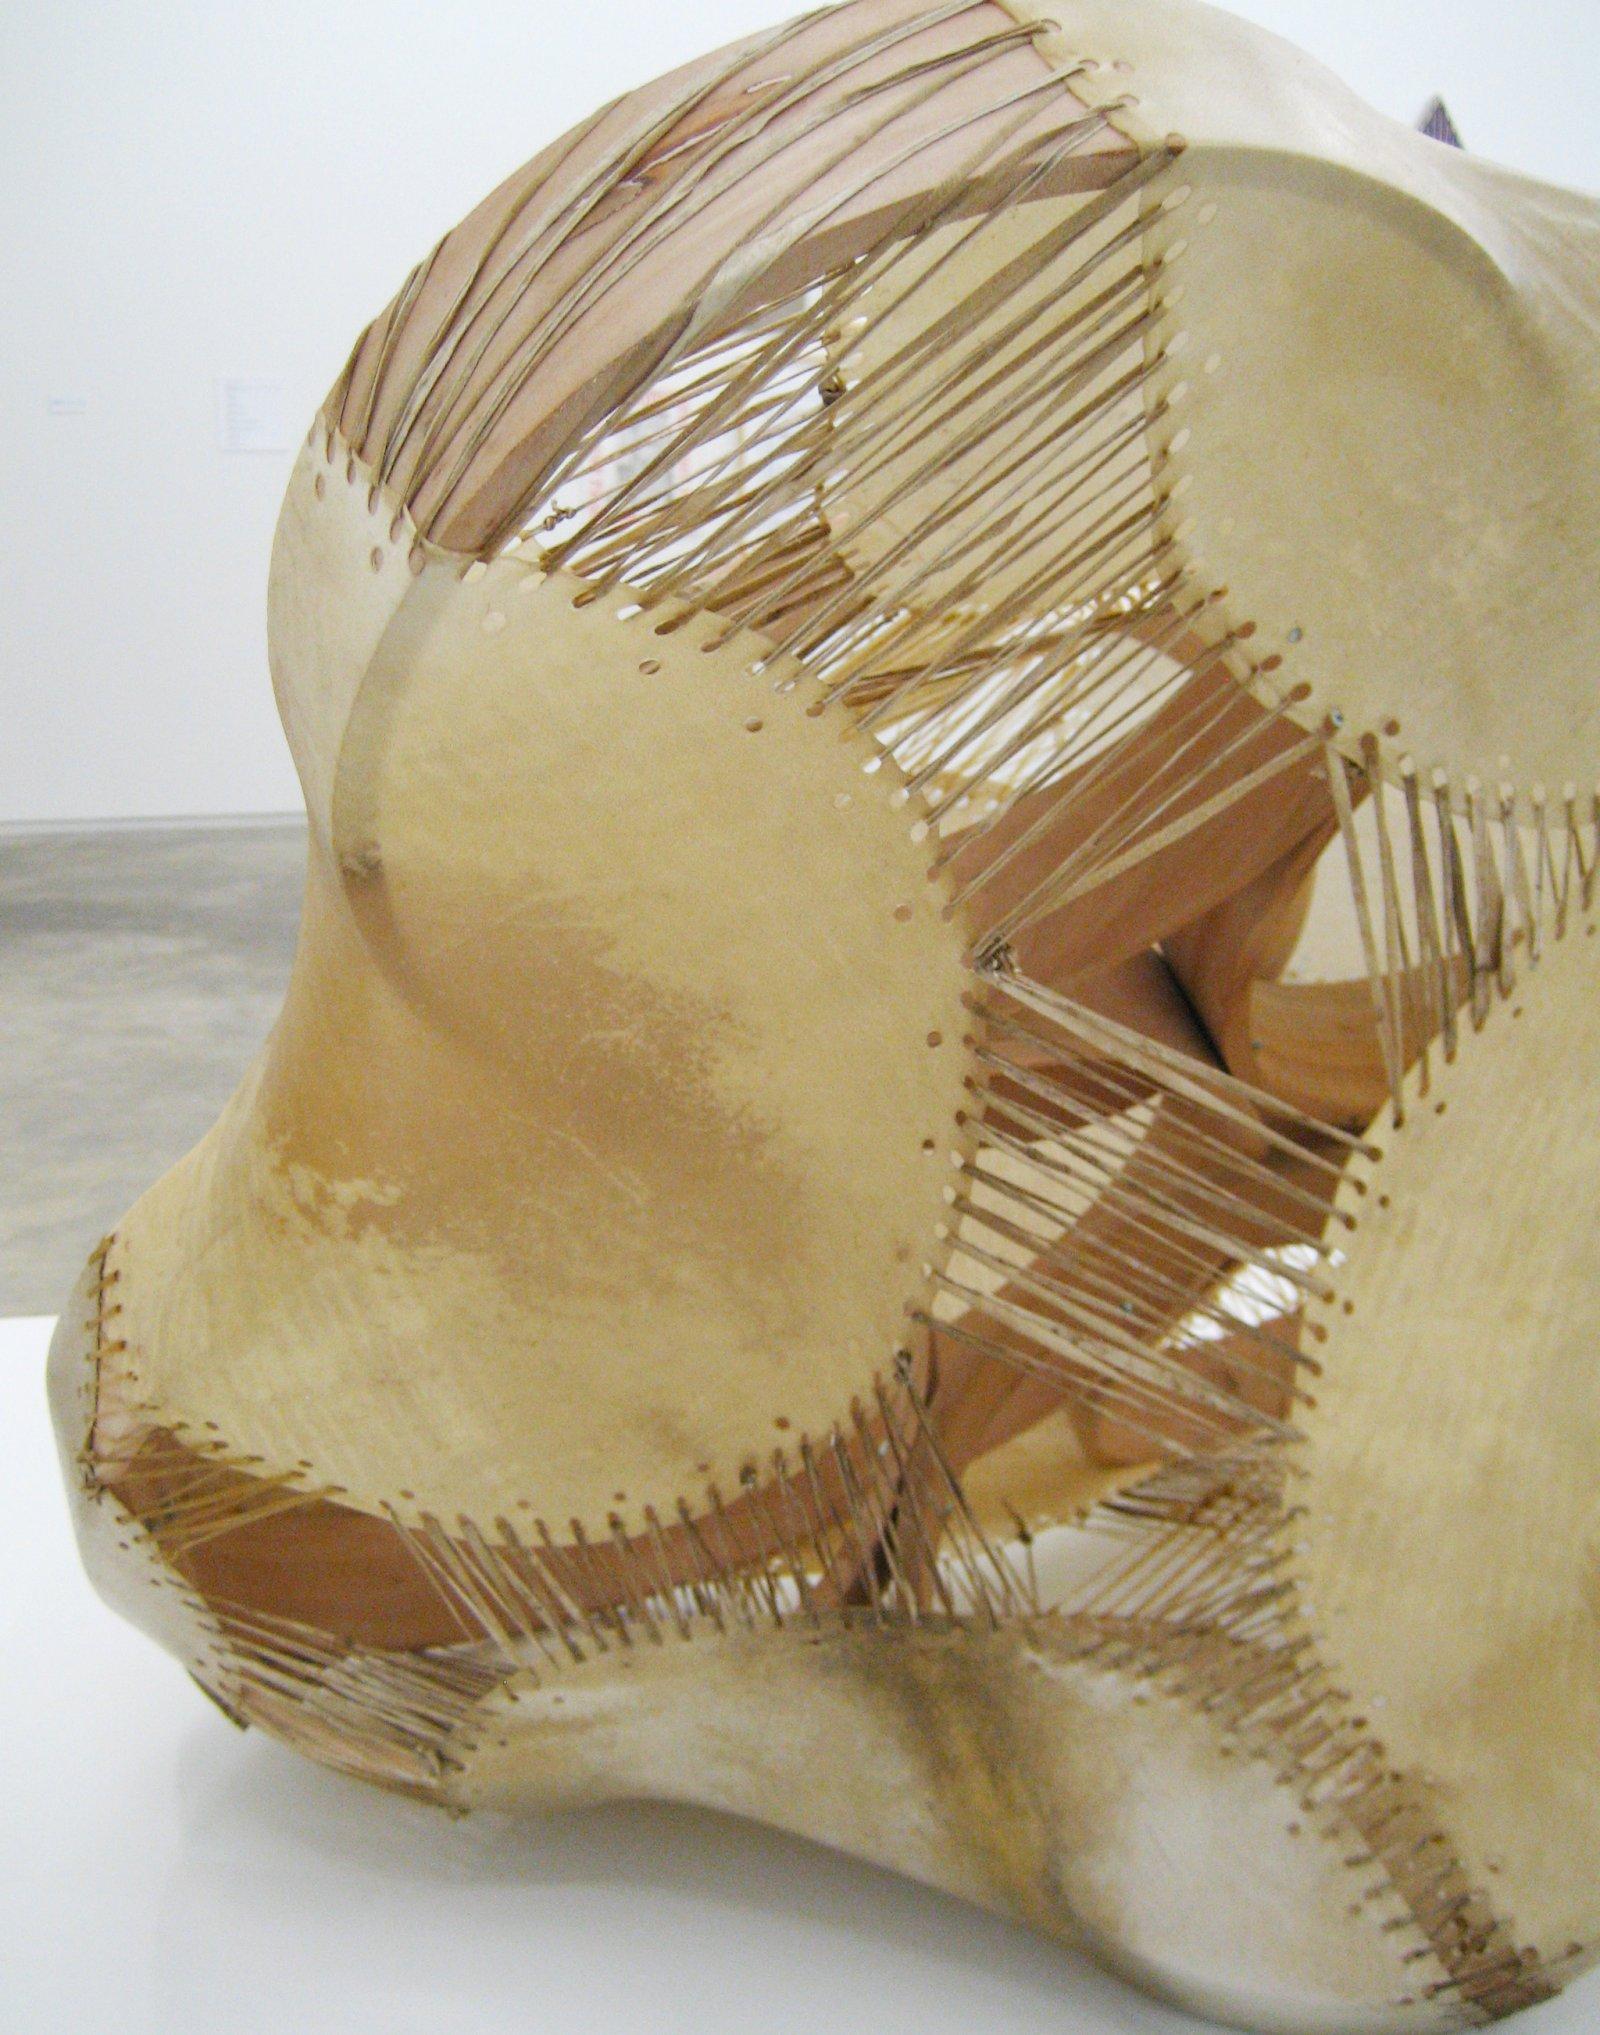 Brian Jungen,Sound Space II(detail), 2010, willow, birch, deer and goat hide, 25 x 34 x 32 in. (64 x 86 x 81 cm)